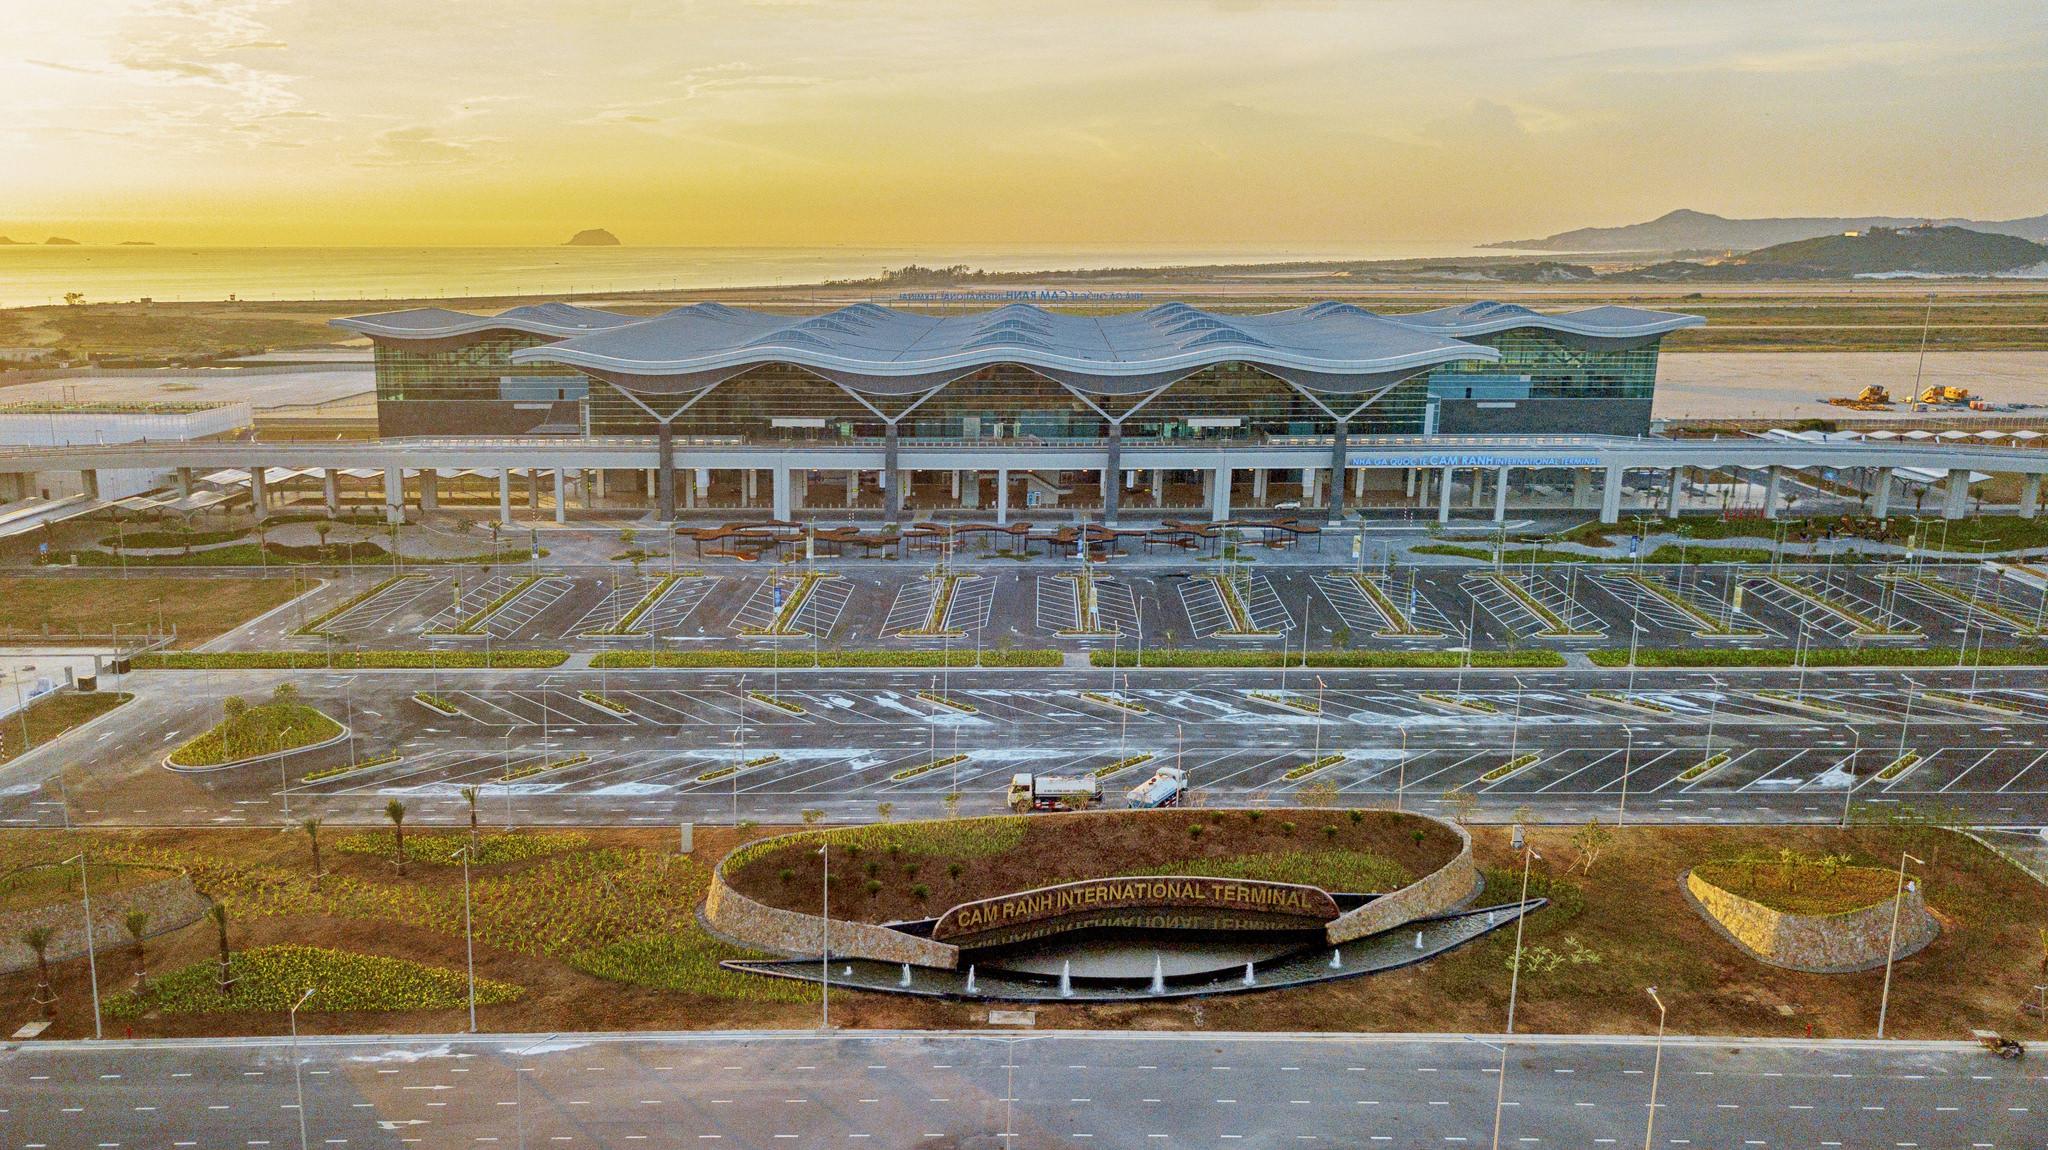 20180626 - Cam Ranh Airport - Architecture - Flycam - 0010.jpg